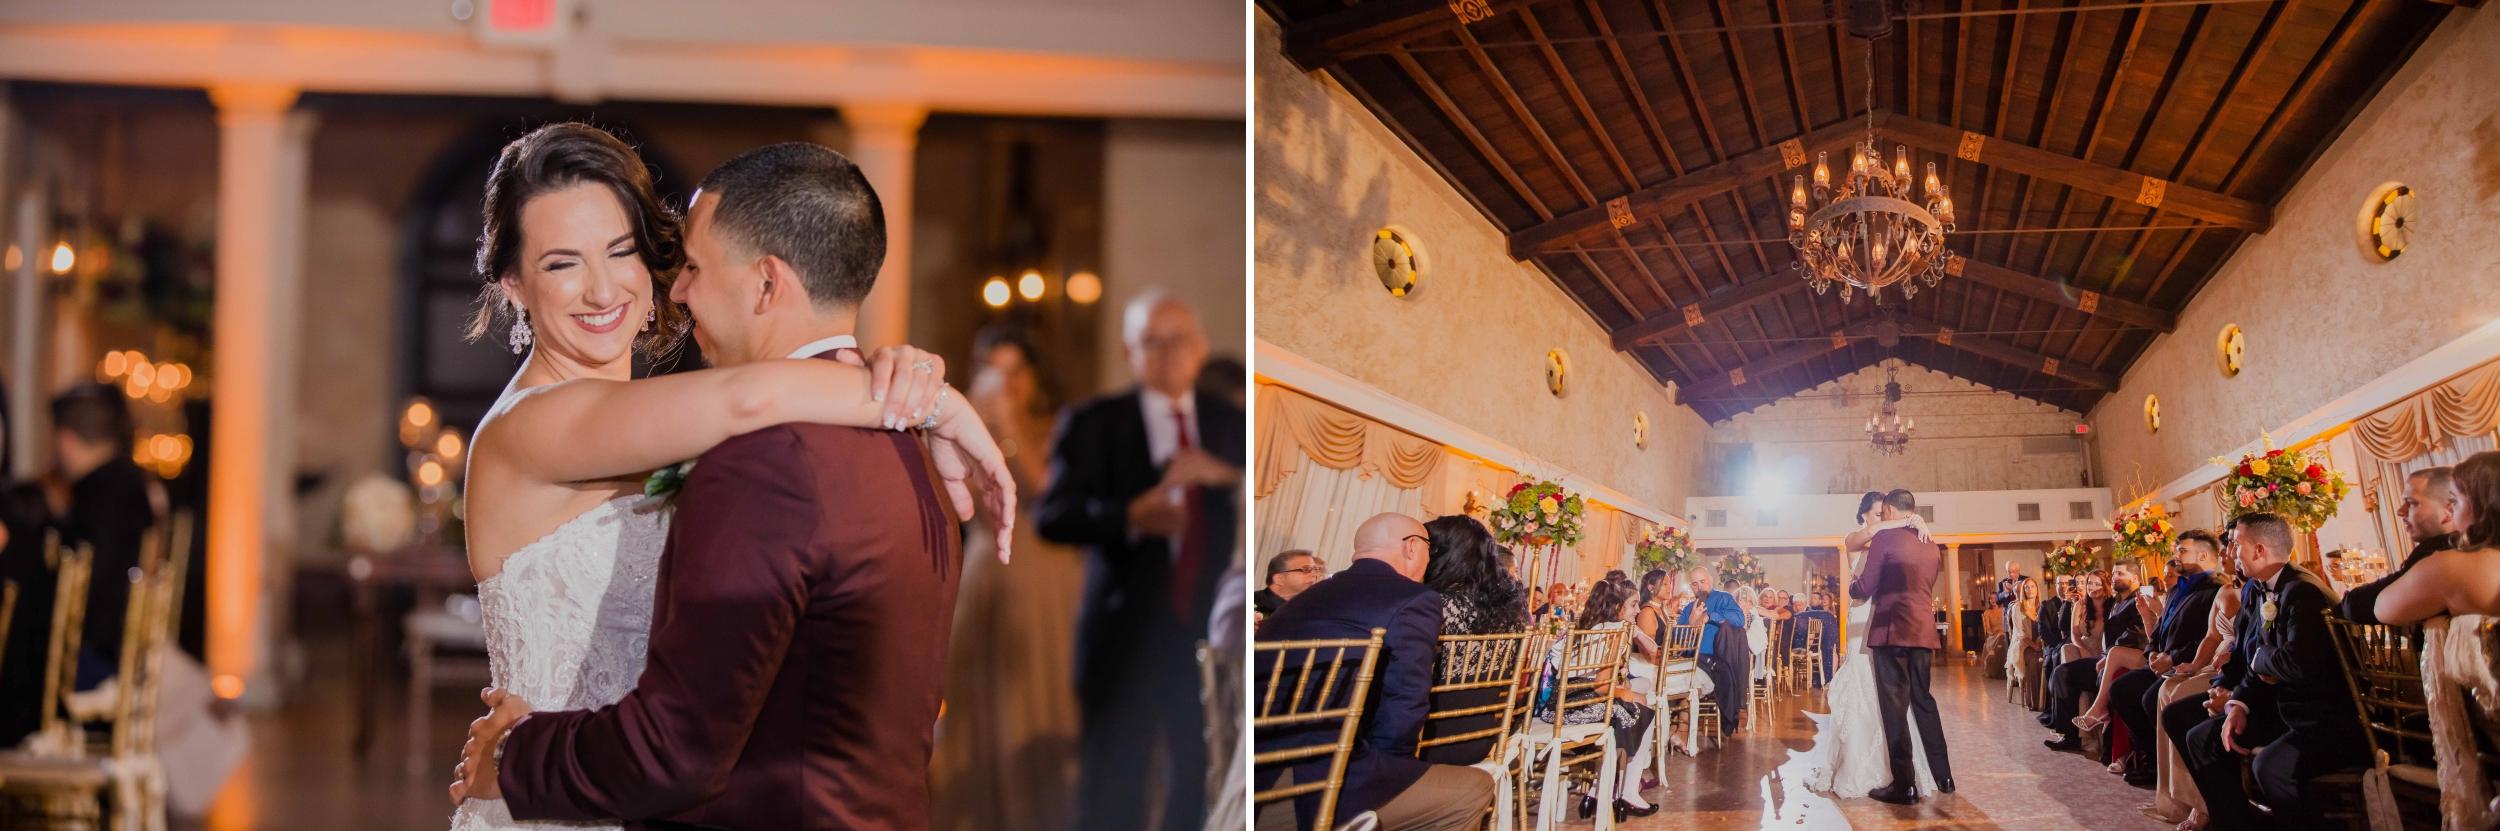 Wedding - Coco Plum - Coral Gables Congregational - Santy Martinez Photography 33.jpg